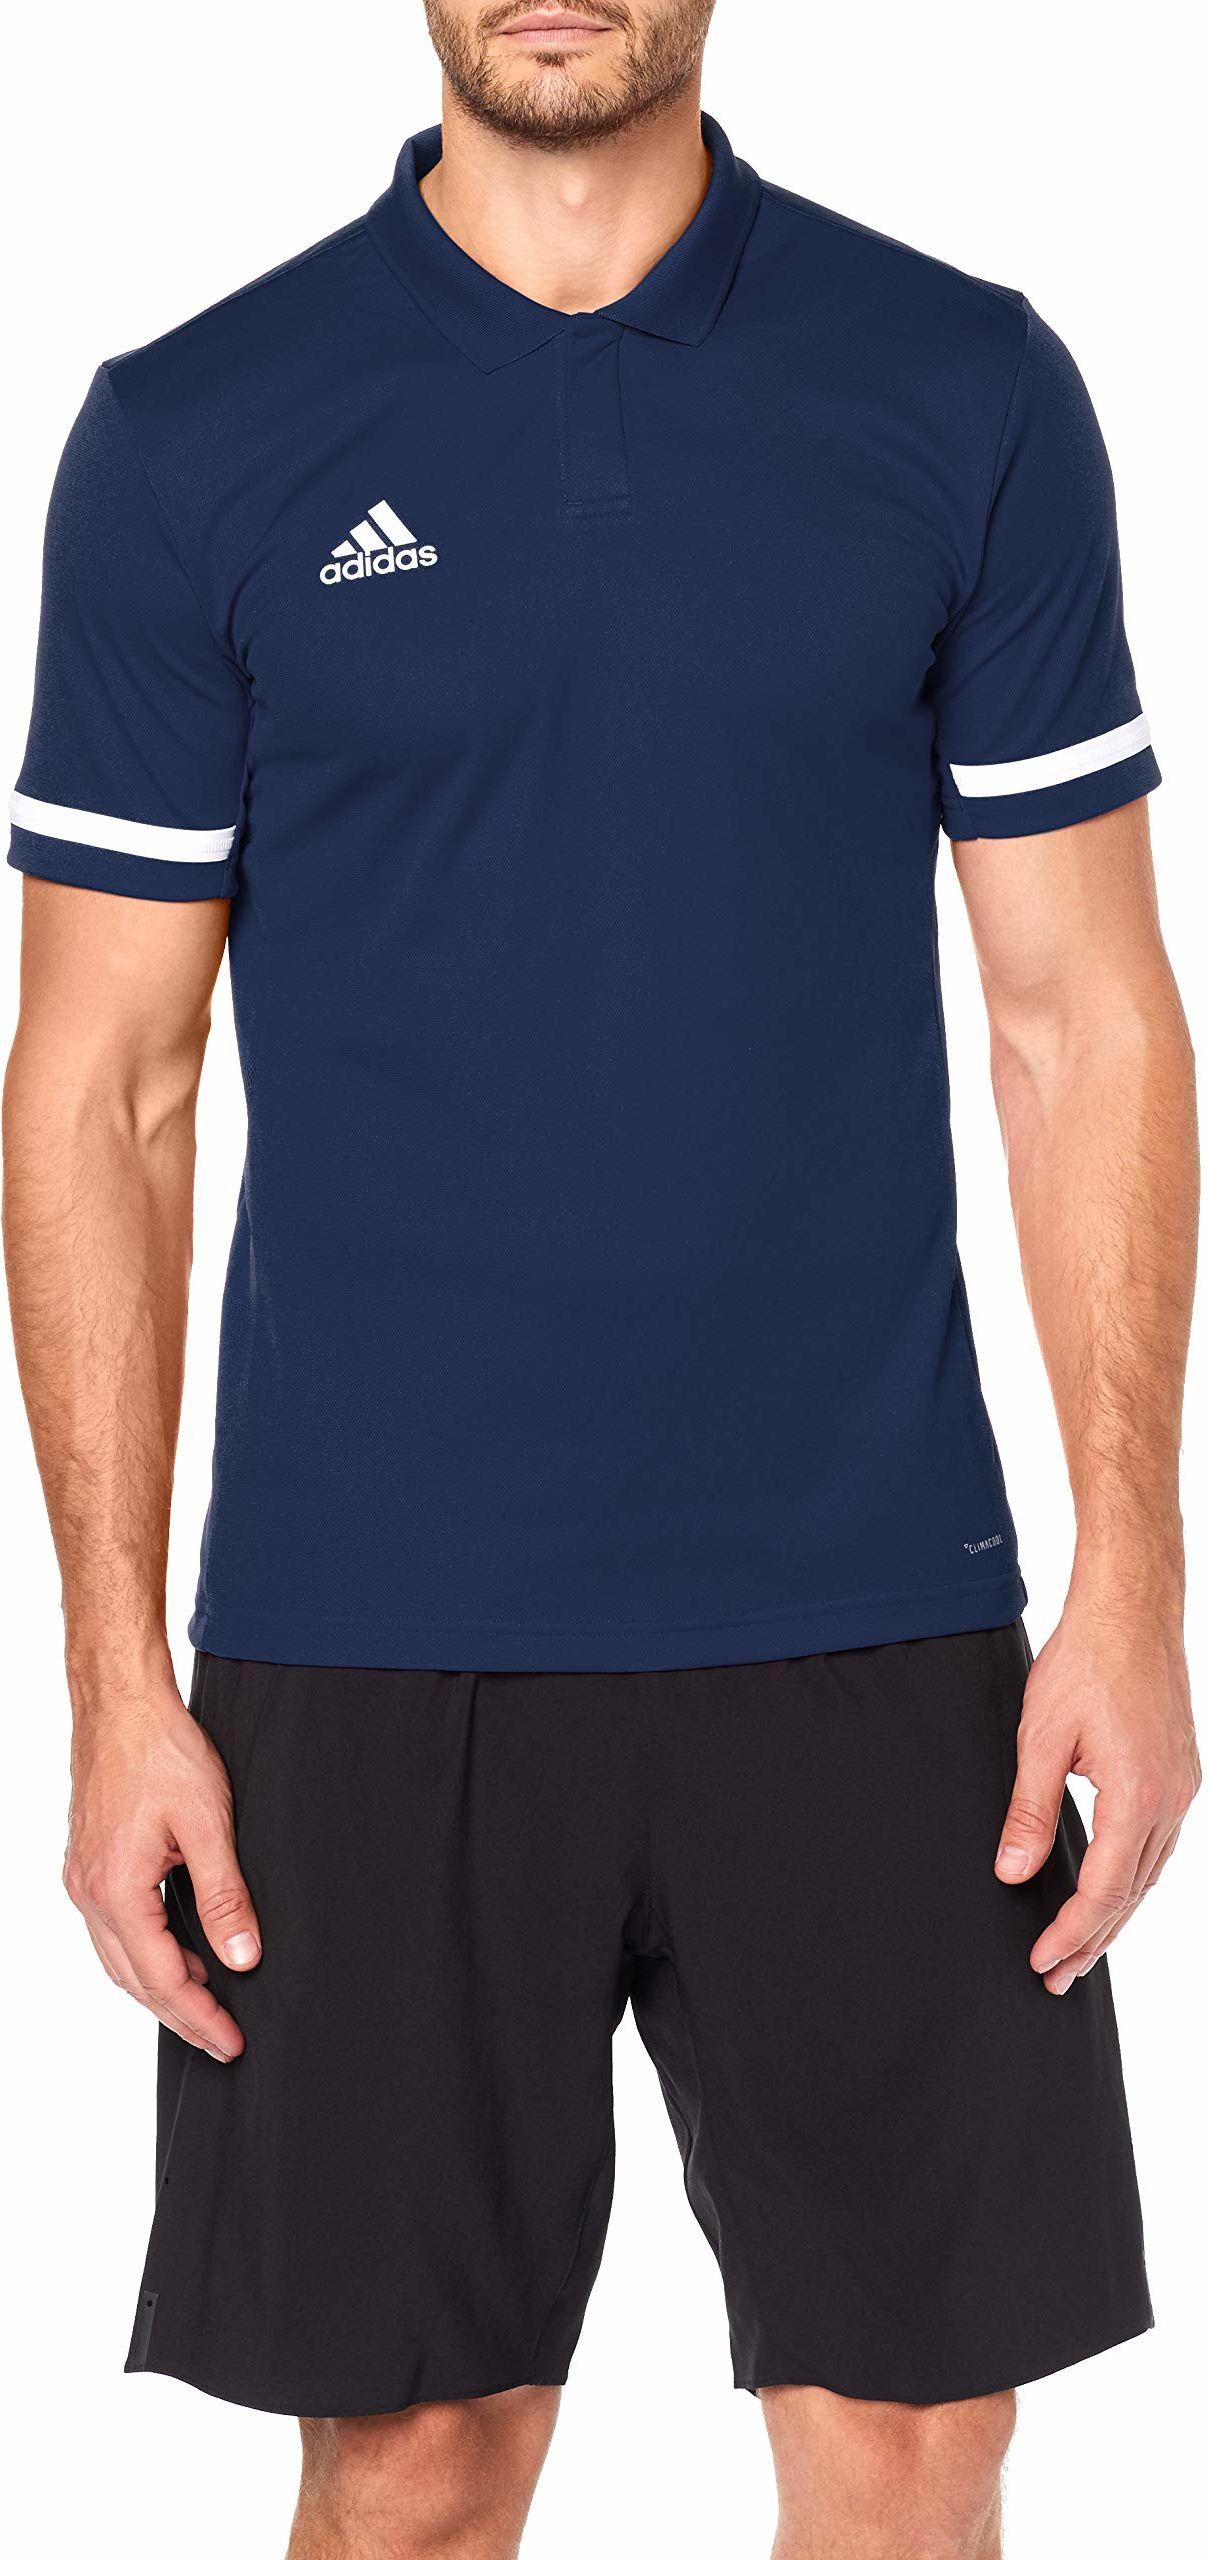 adidas Męska koszulka polo T19 Polo M niebieski Granatowy (Team Navy Blue)/bia?y 3XL